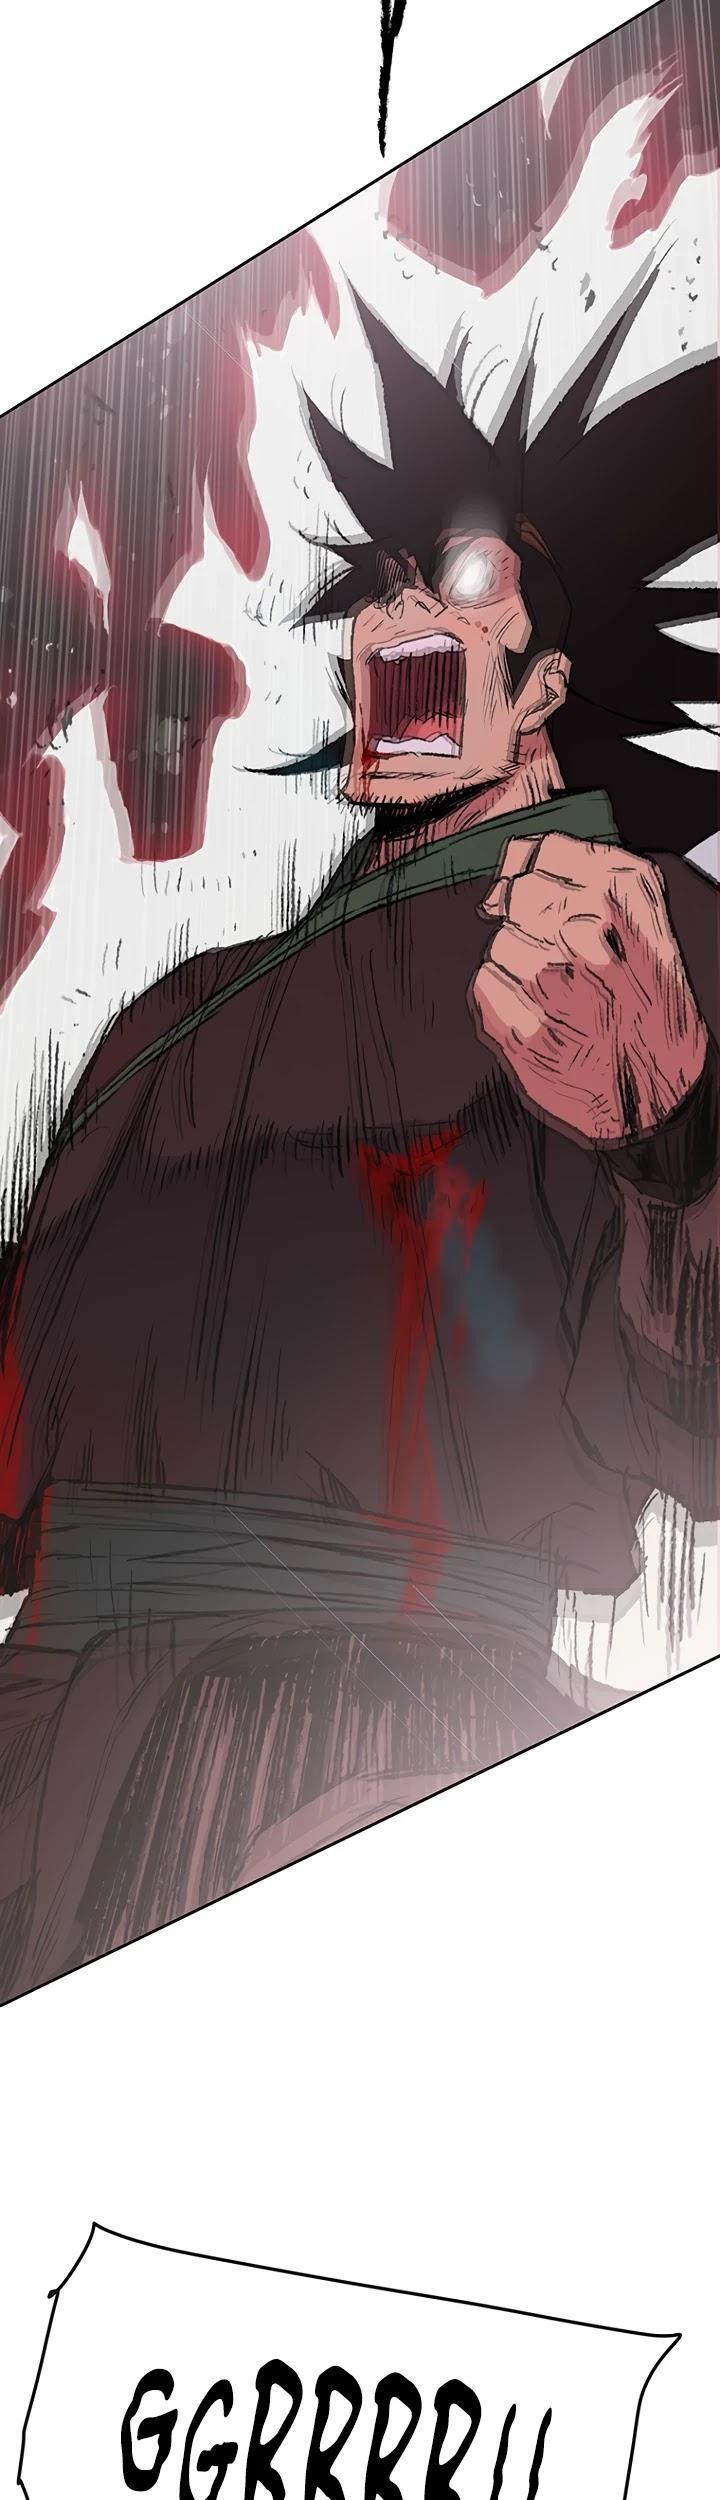 The Undefeatable Swordsman Chapter 73 page 44 - Mangakakalots.com